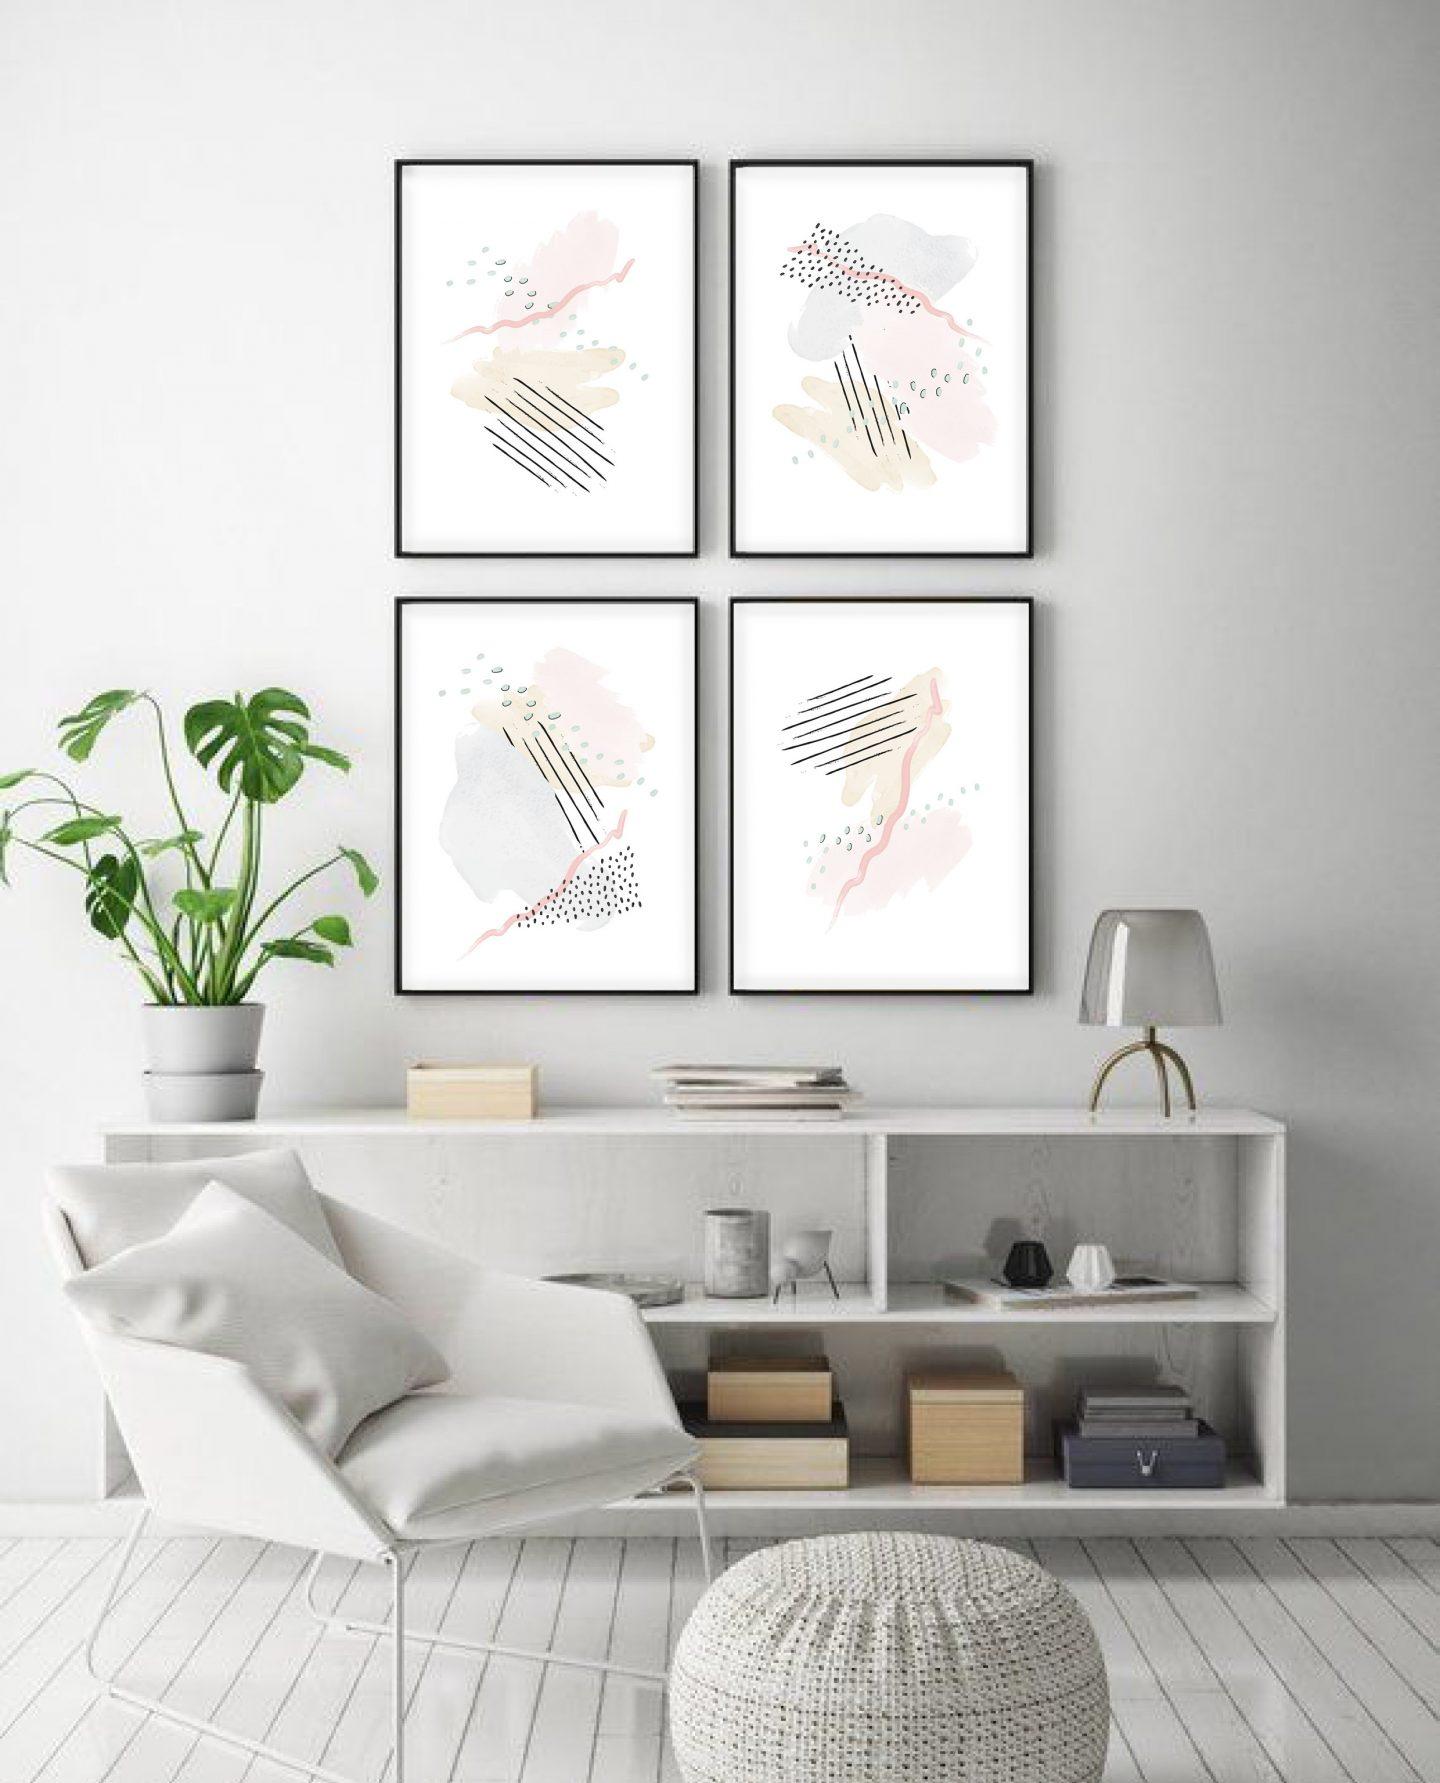 OSK Art prints